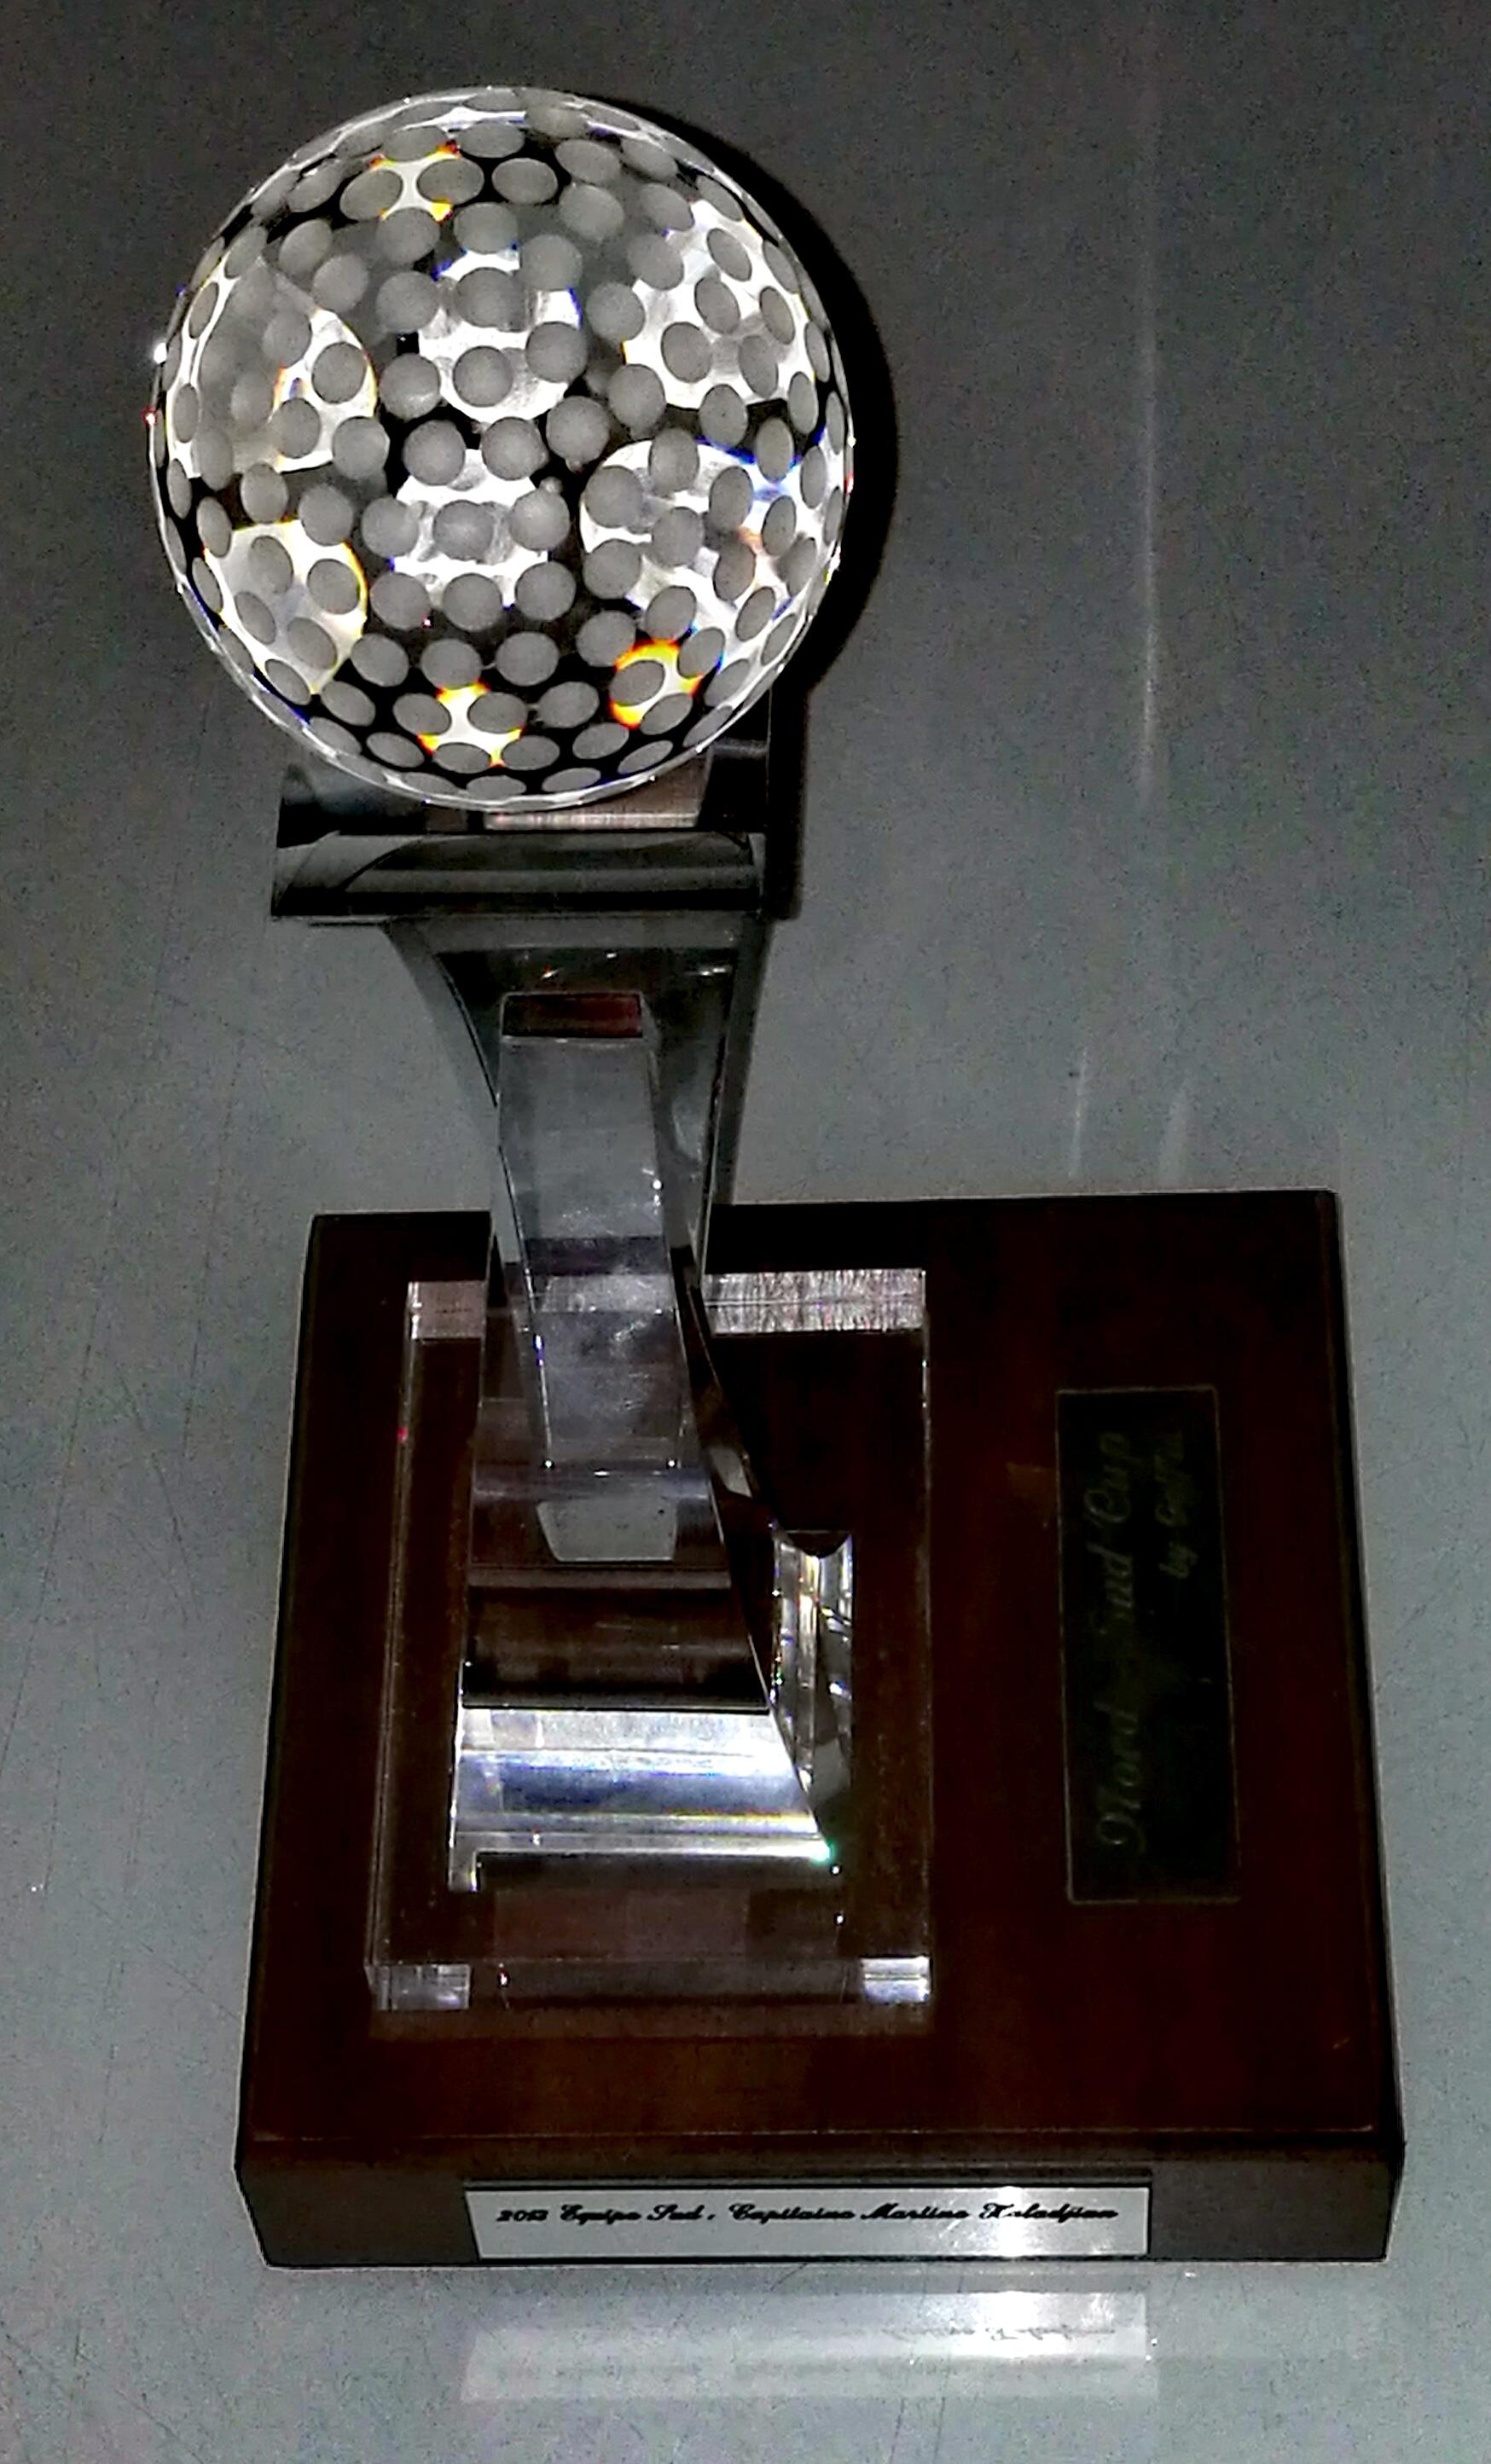 La Cup